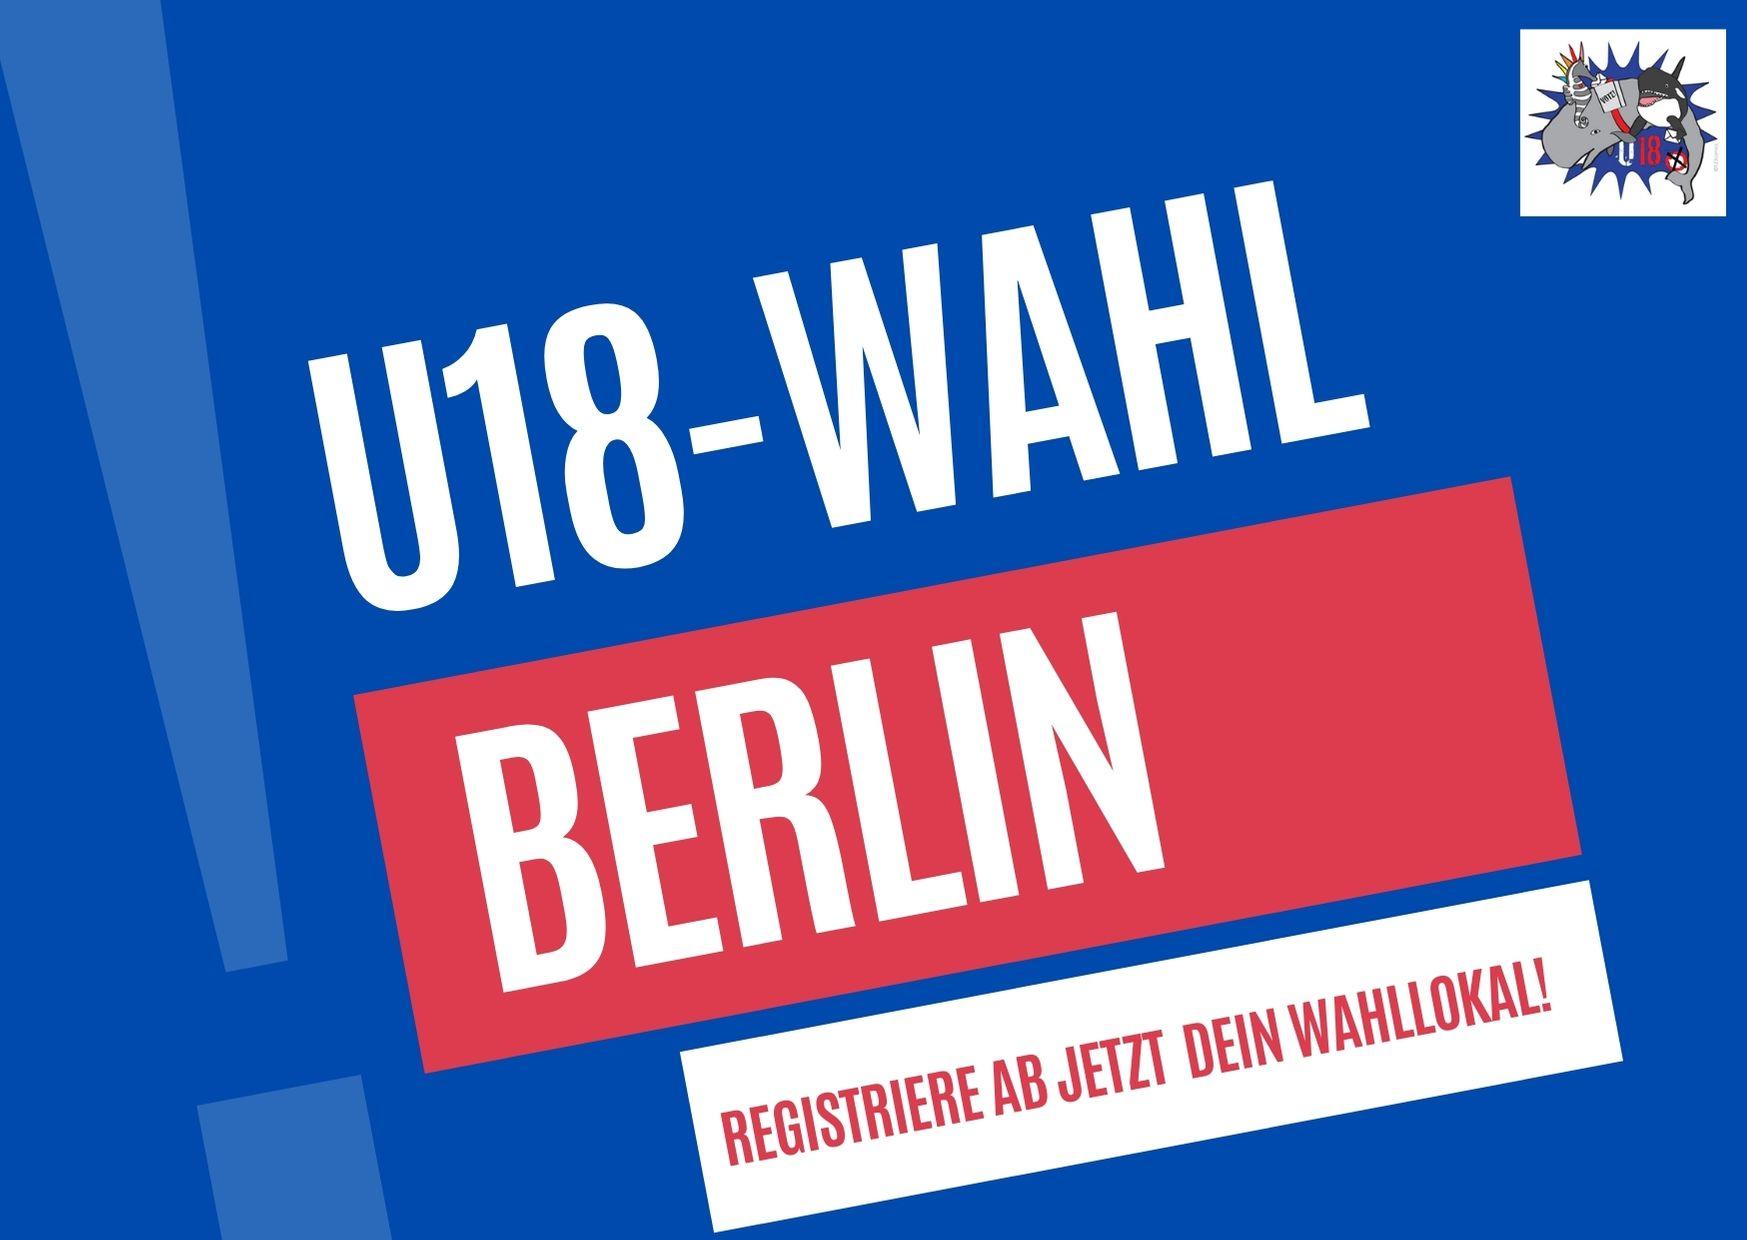 U18-Wahl Berlin: Registriere jetzt dein Wahllokal!